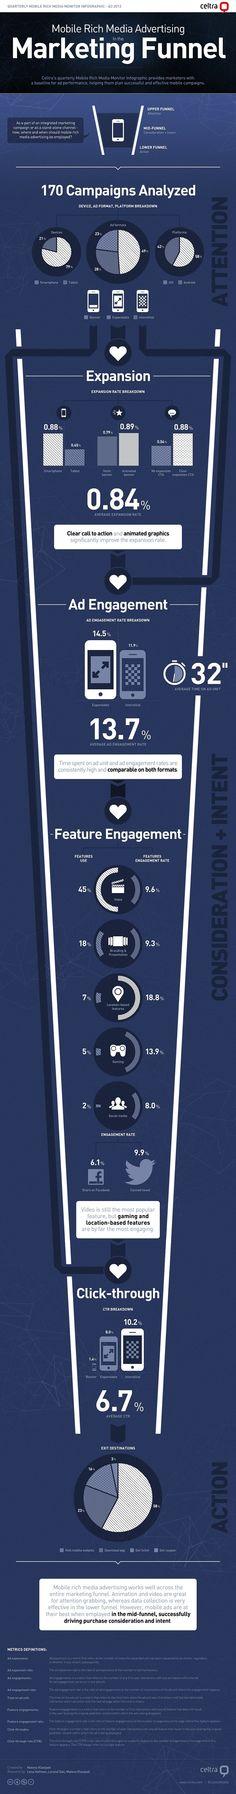 Best Practice Mobile Ad-Kampagnen